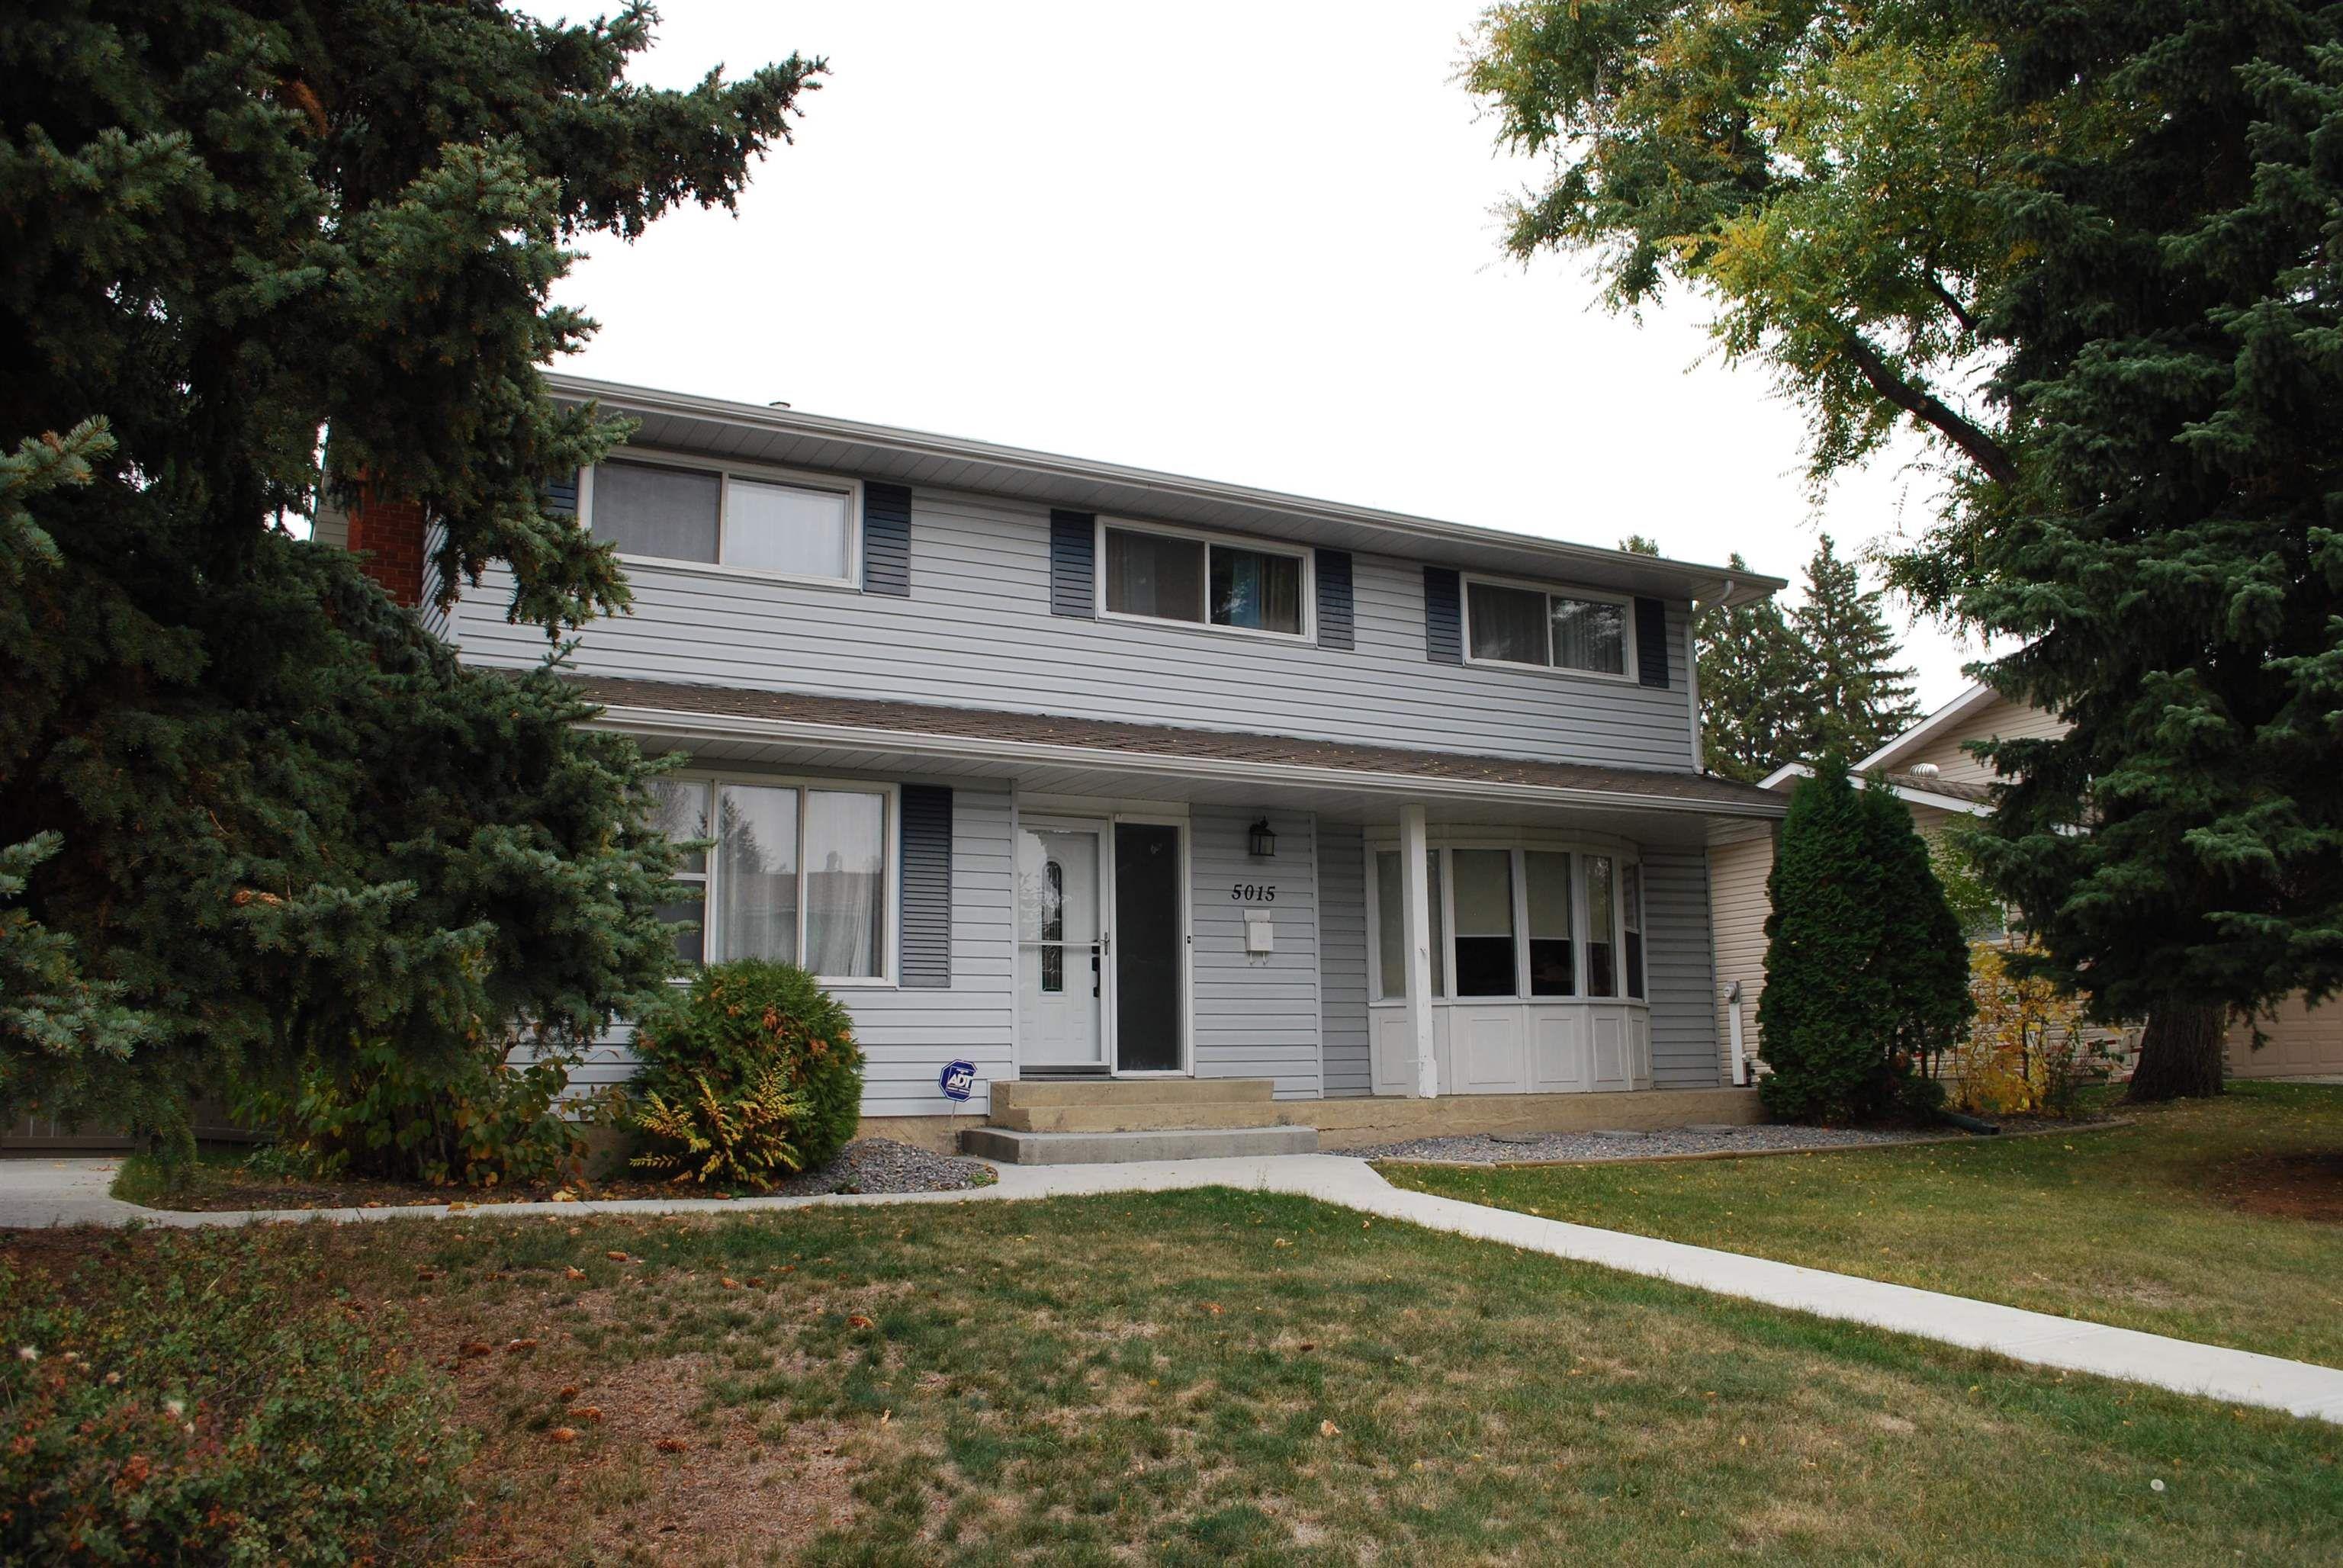 Main Photo: 5015 126 Street in Edmonton: Zone 15 House for sale : MLS®# E4265468